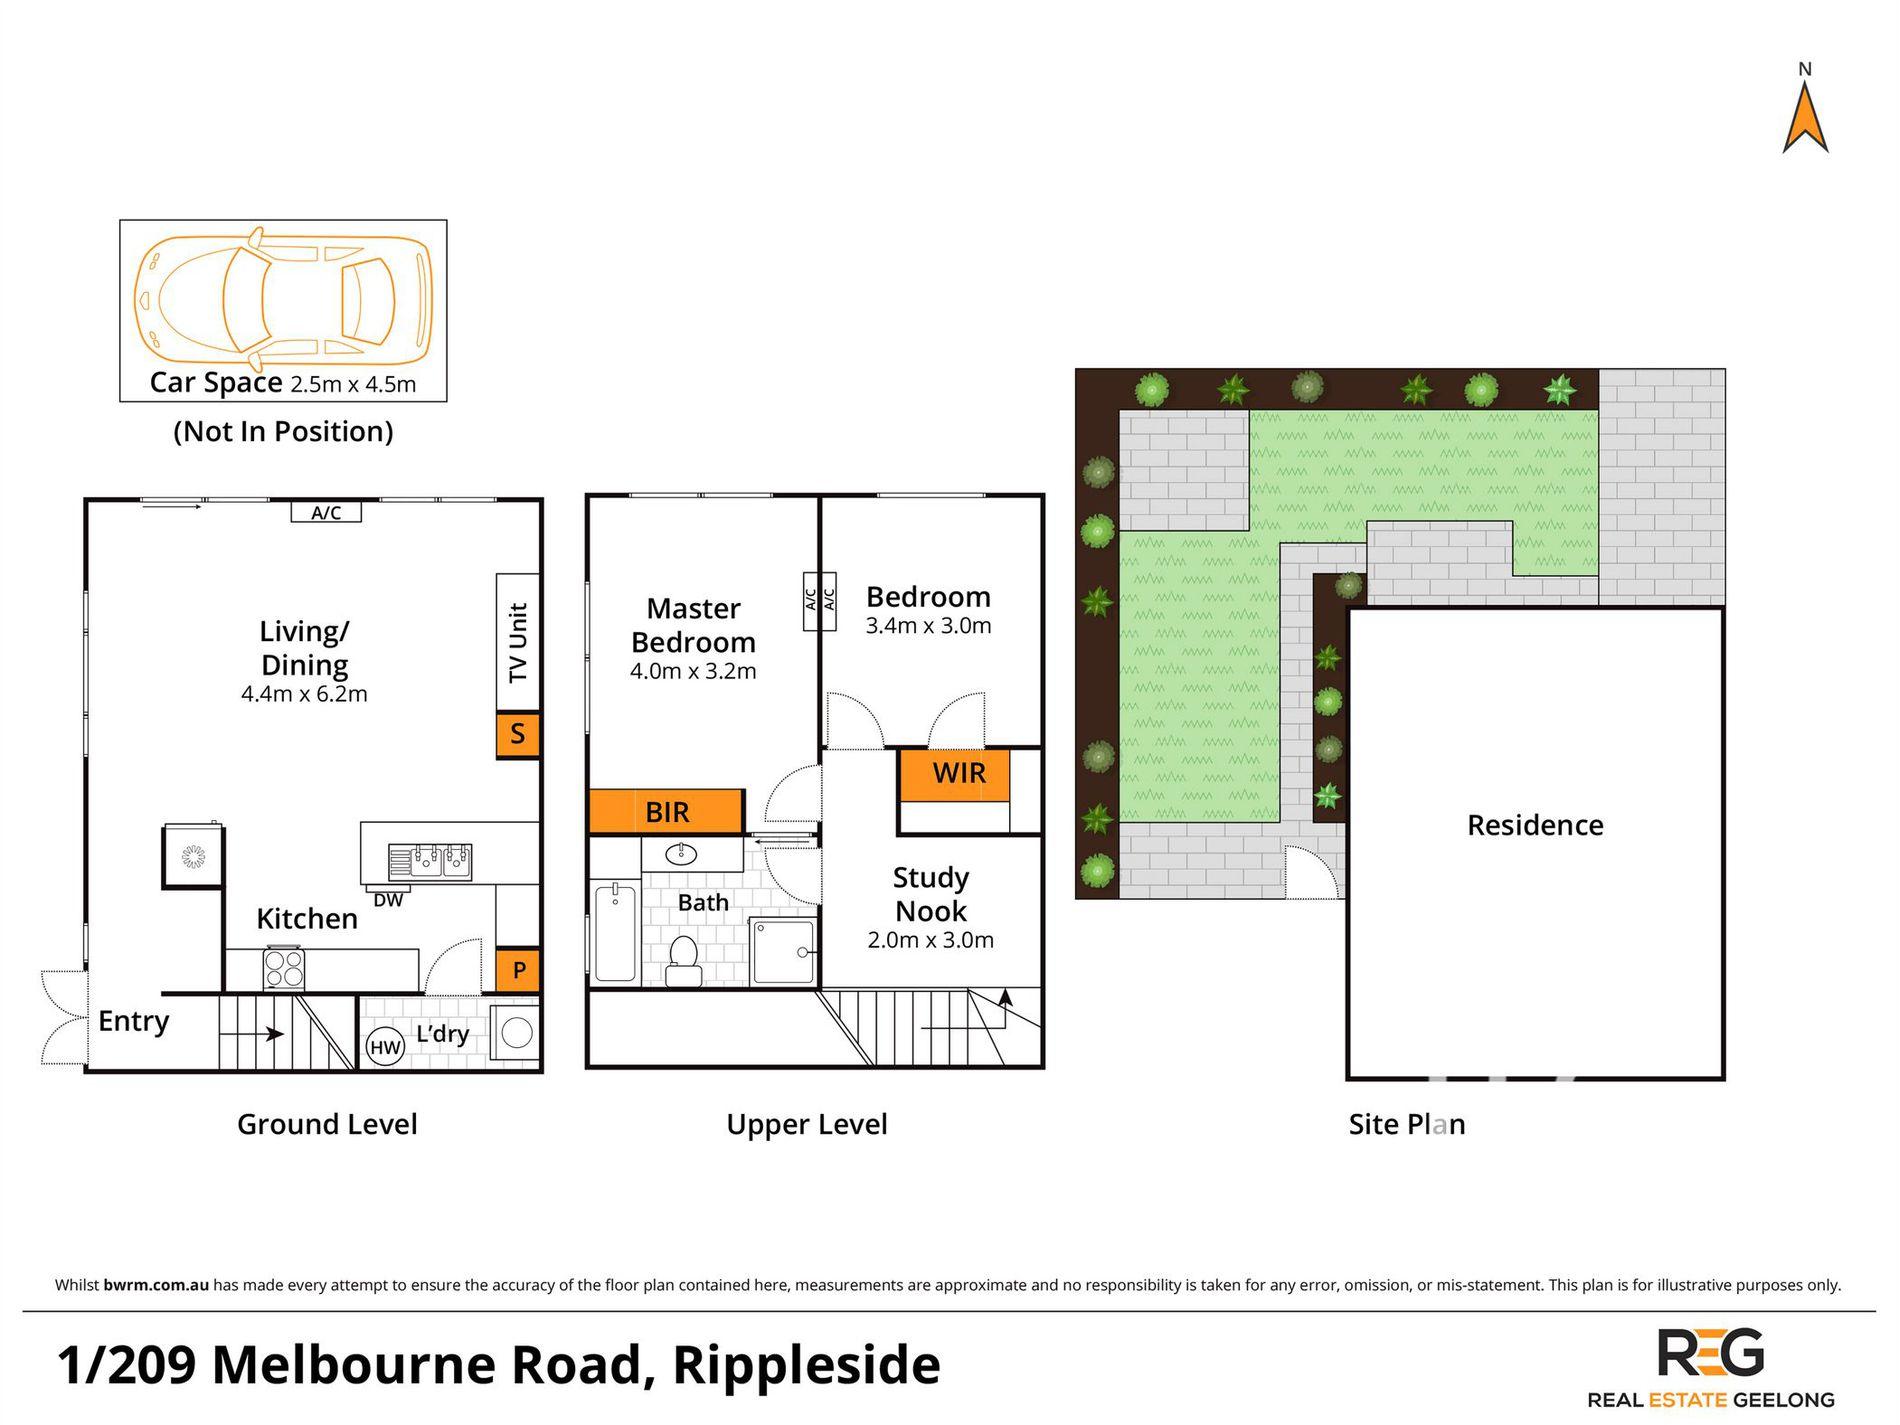 1 / 209 MELBOURNE ROAD, Rippleside